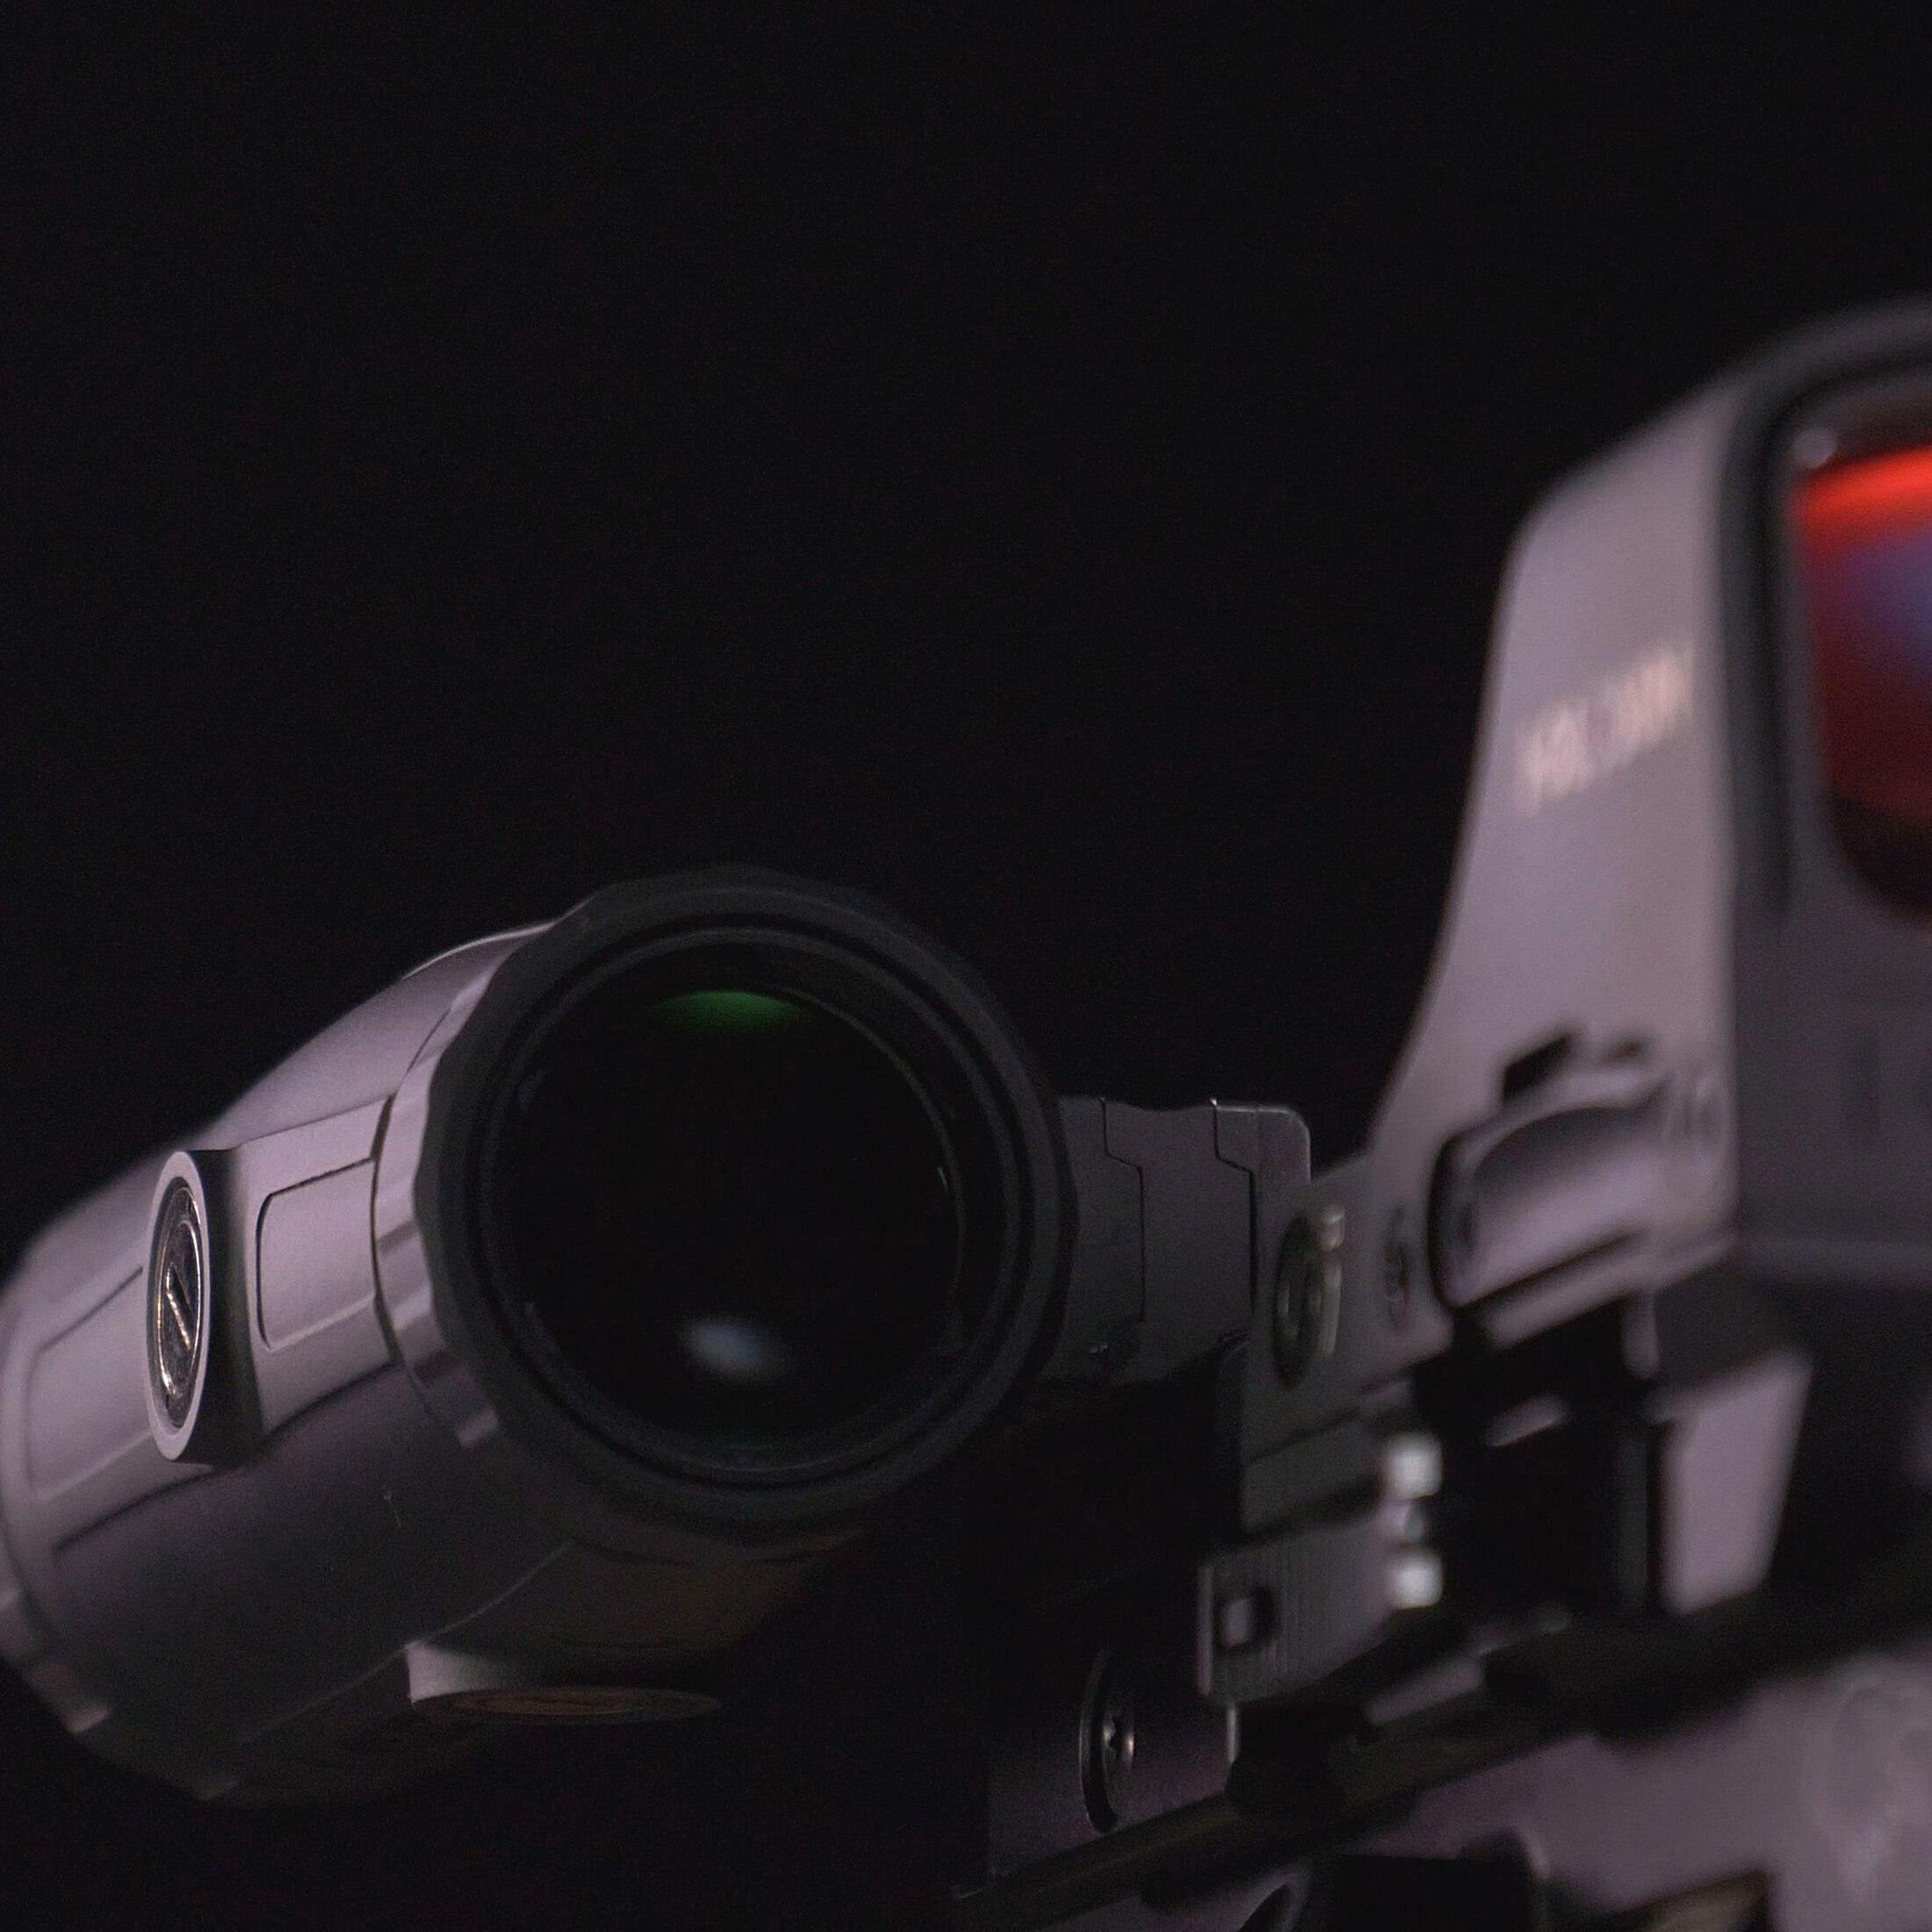 Holosun Magnifier HM3X